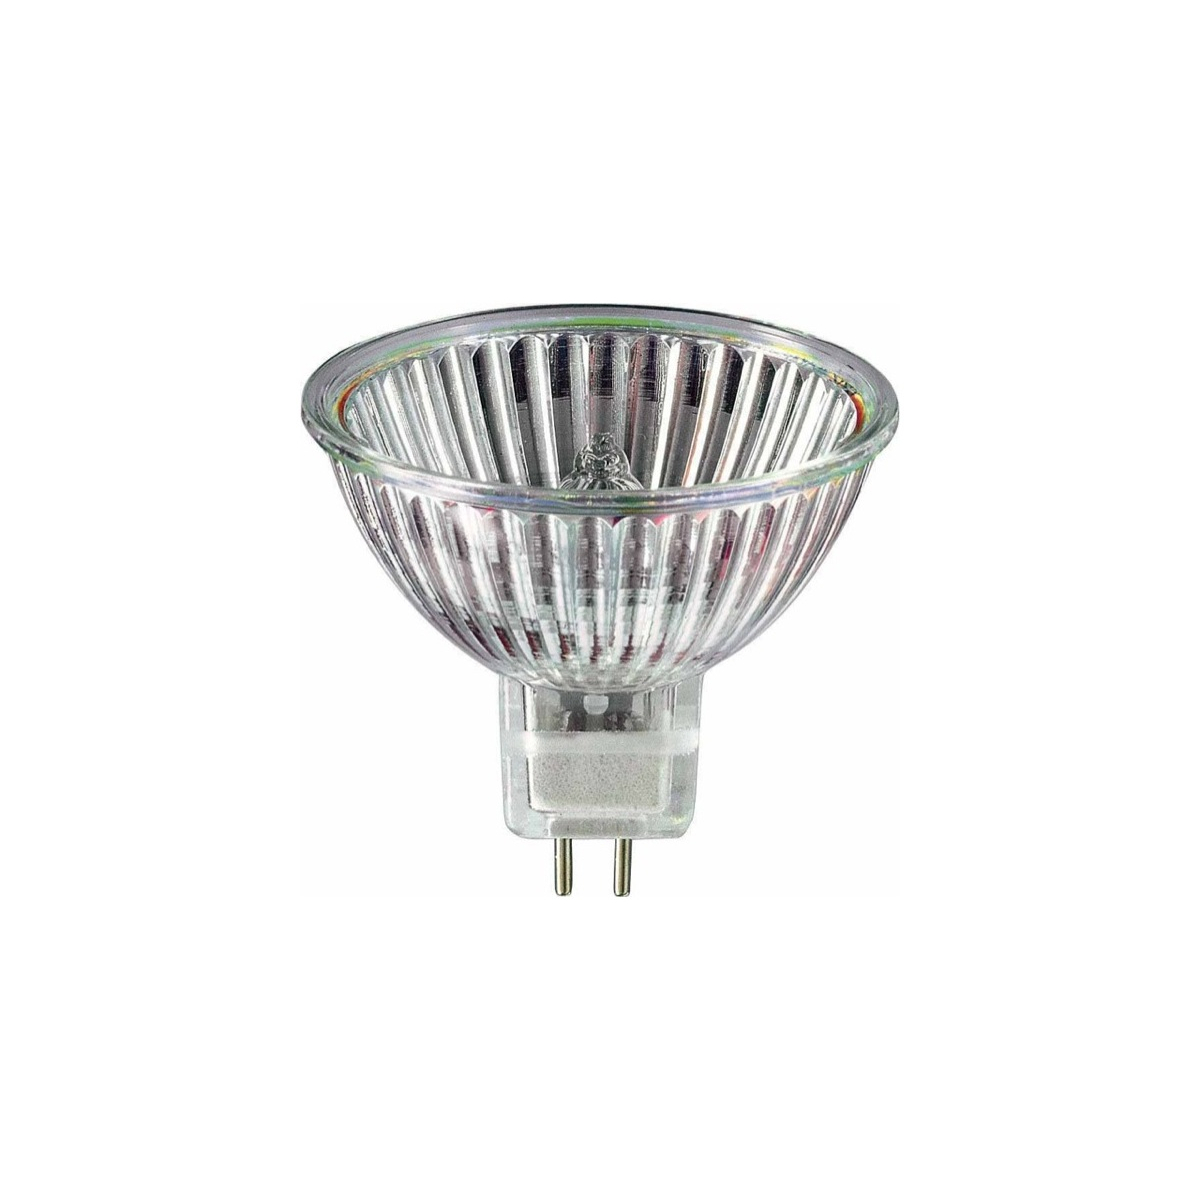 Ampoules halogènes - Osram / GE / Philips - ELC 24V 250W